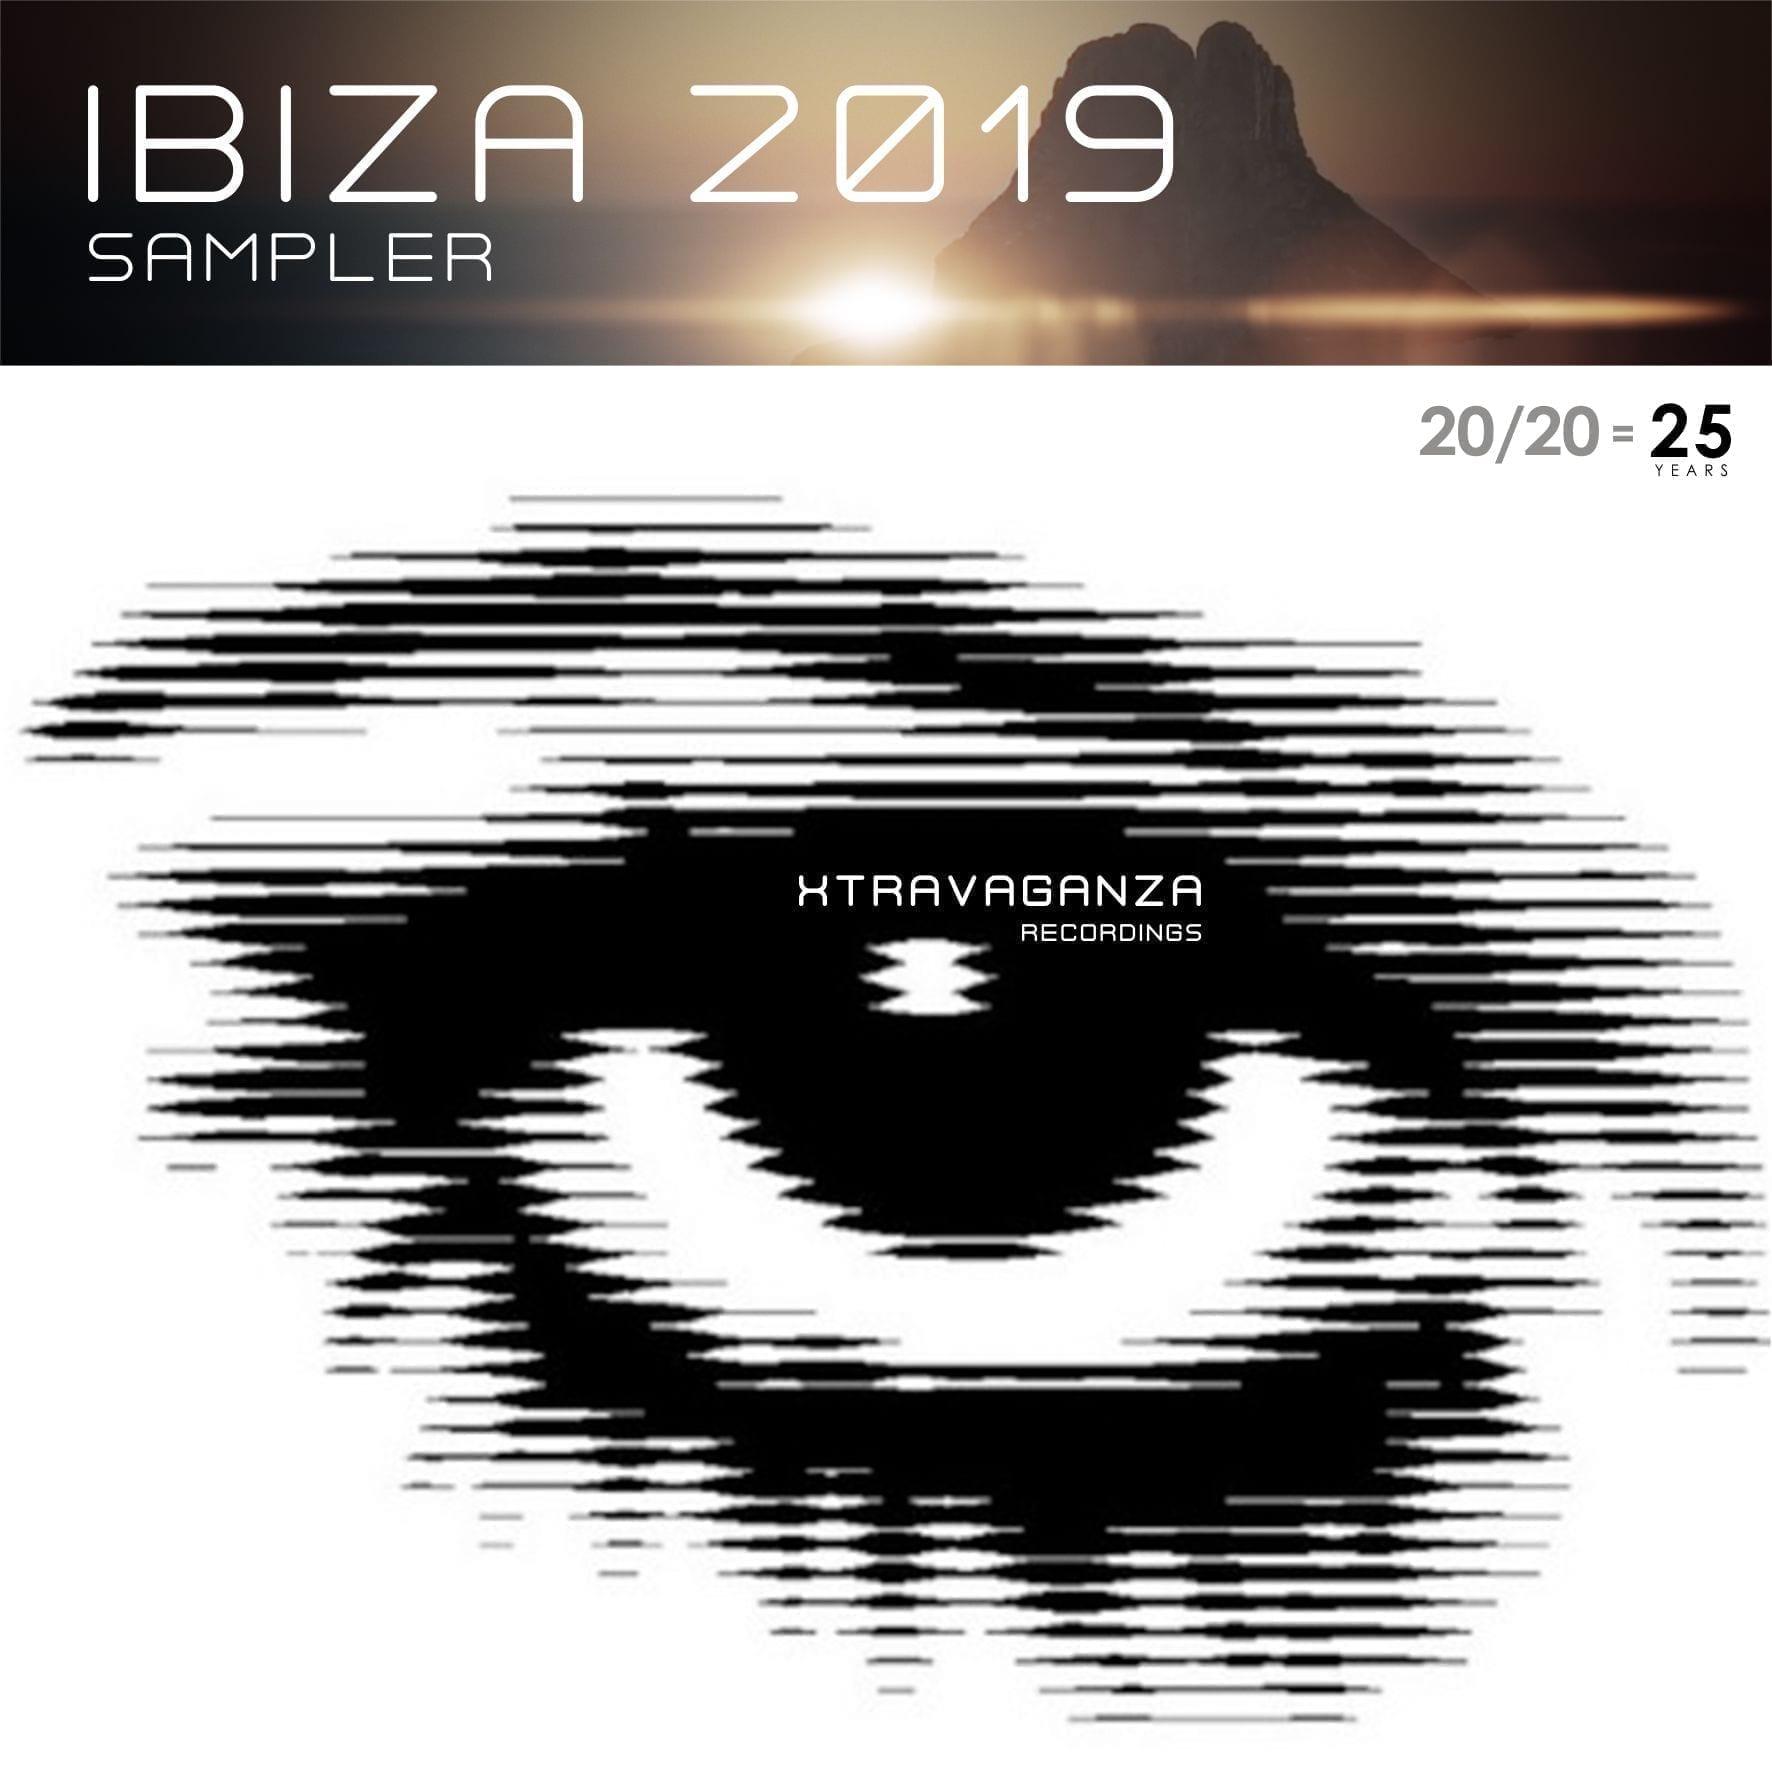 ExtravaganzaRecordings return with their Ibiza 2019 Sampler